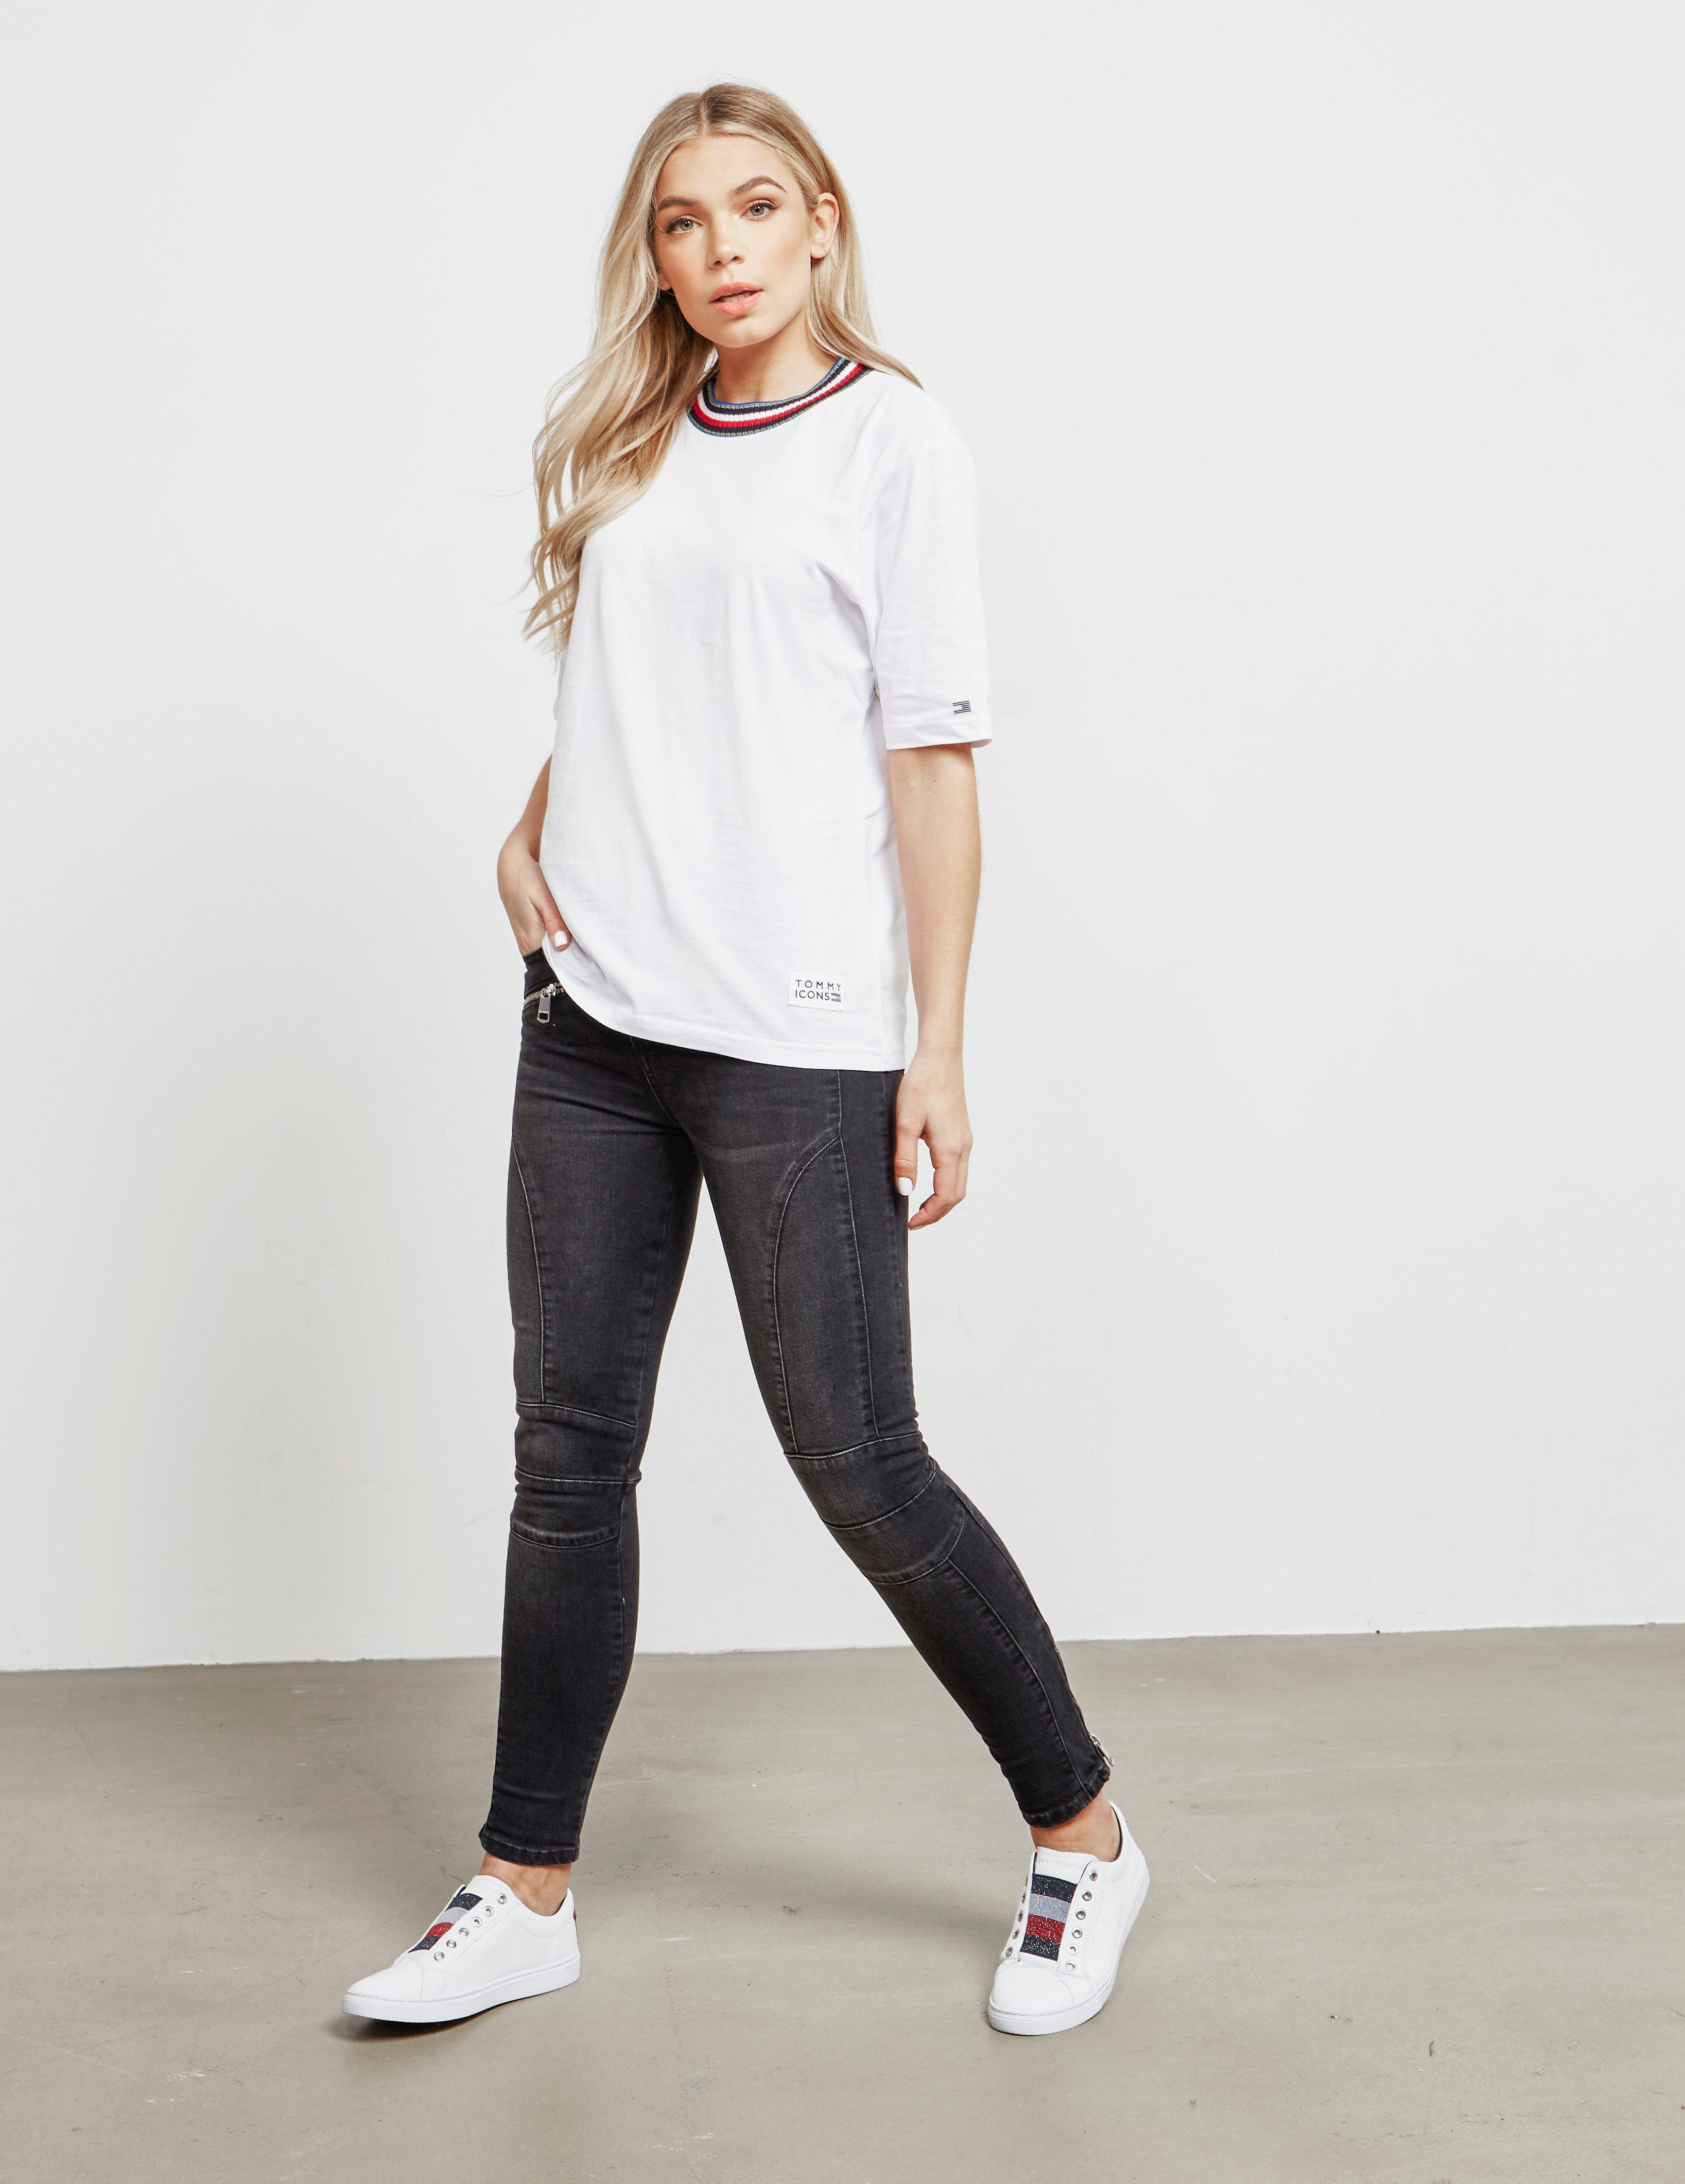 4f1447124 Tommy Hilfiger Tira Short Sleeve T-shirt White in White - Lyst